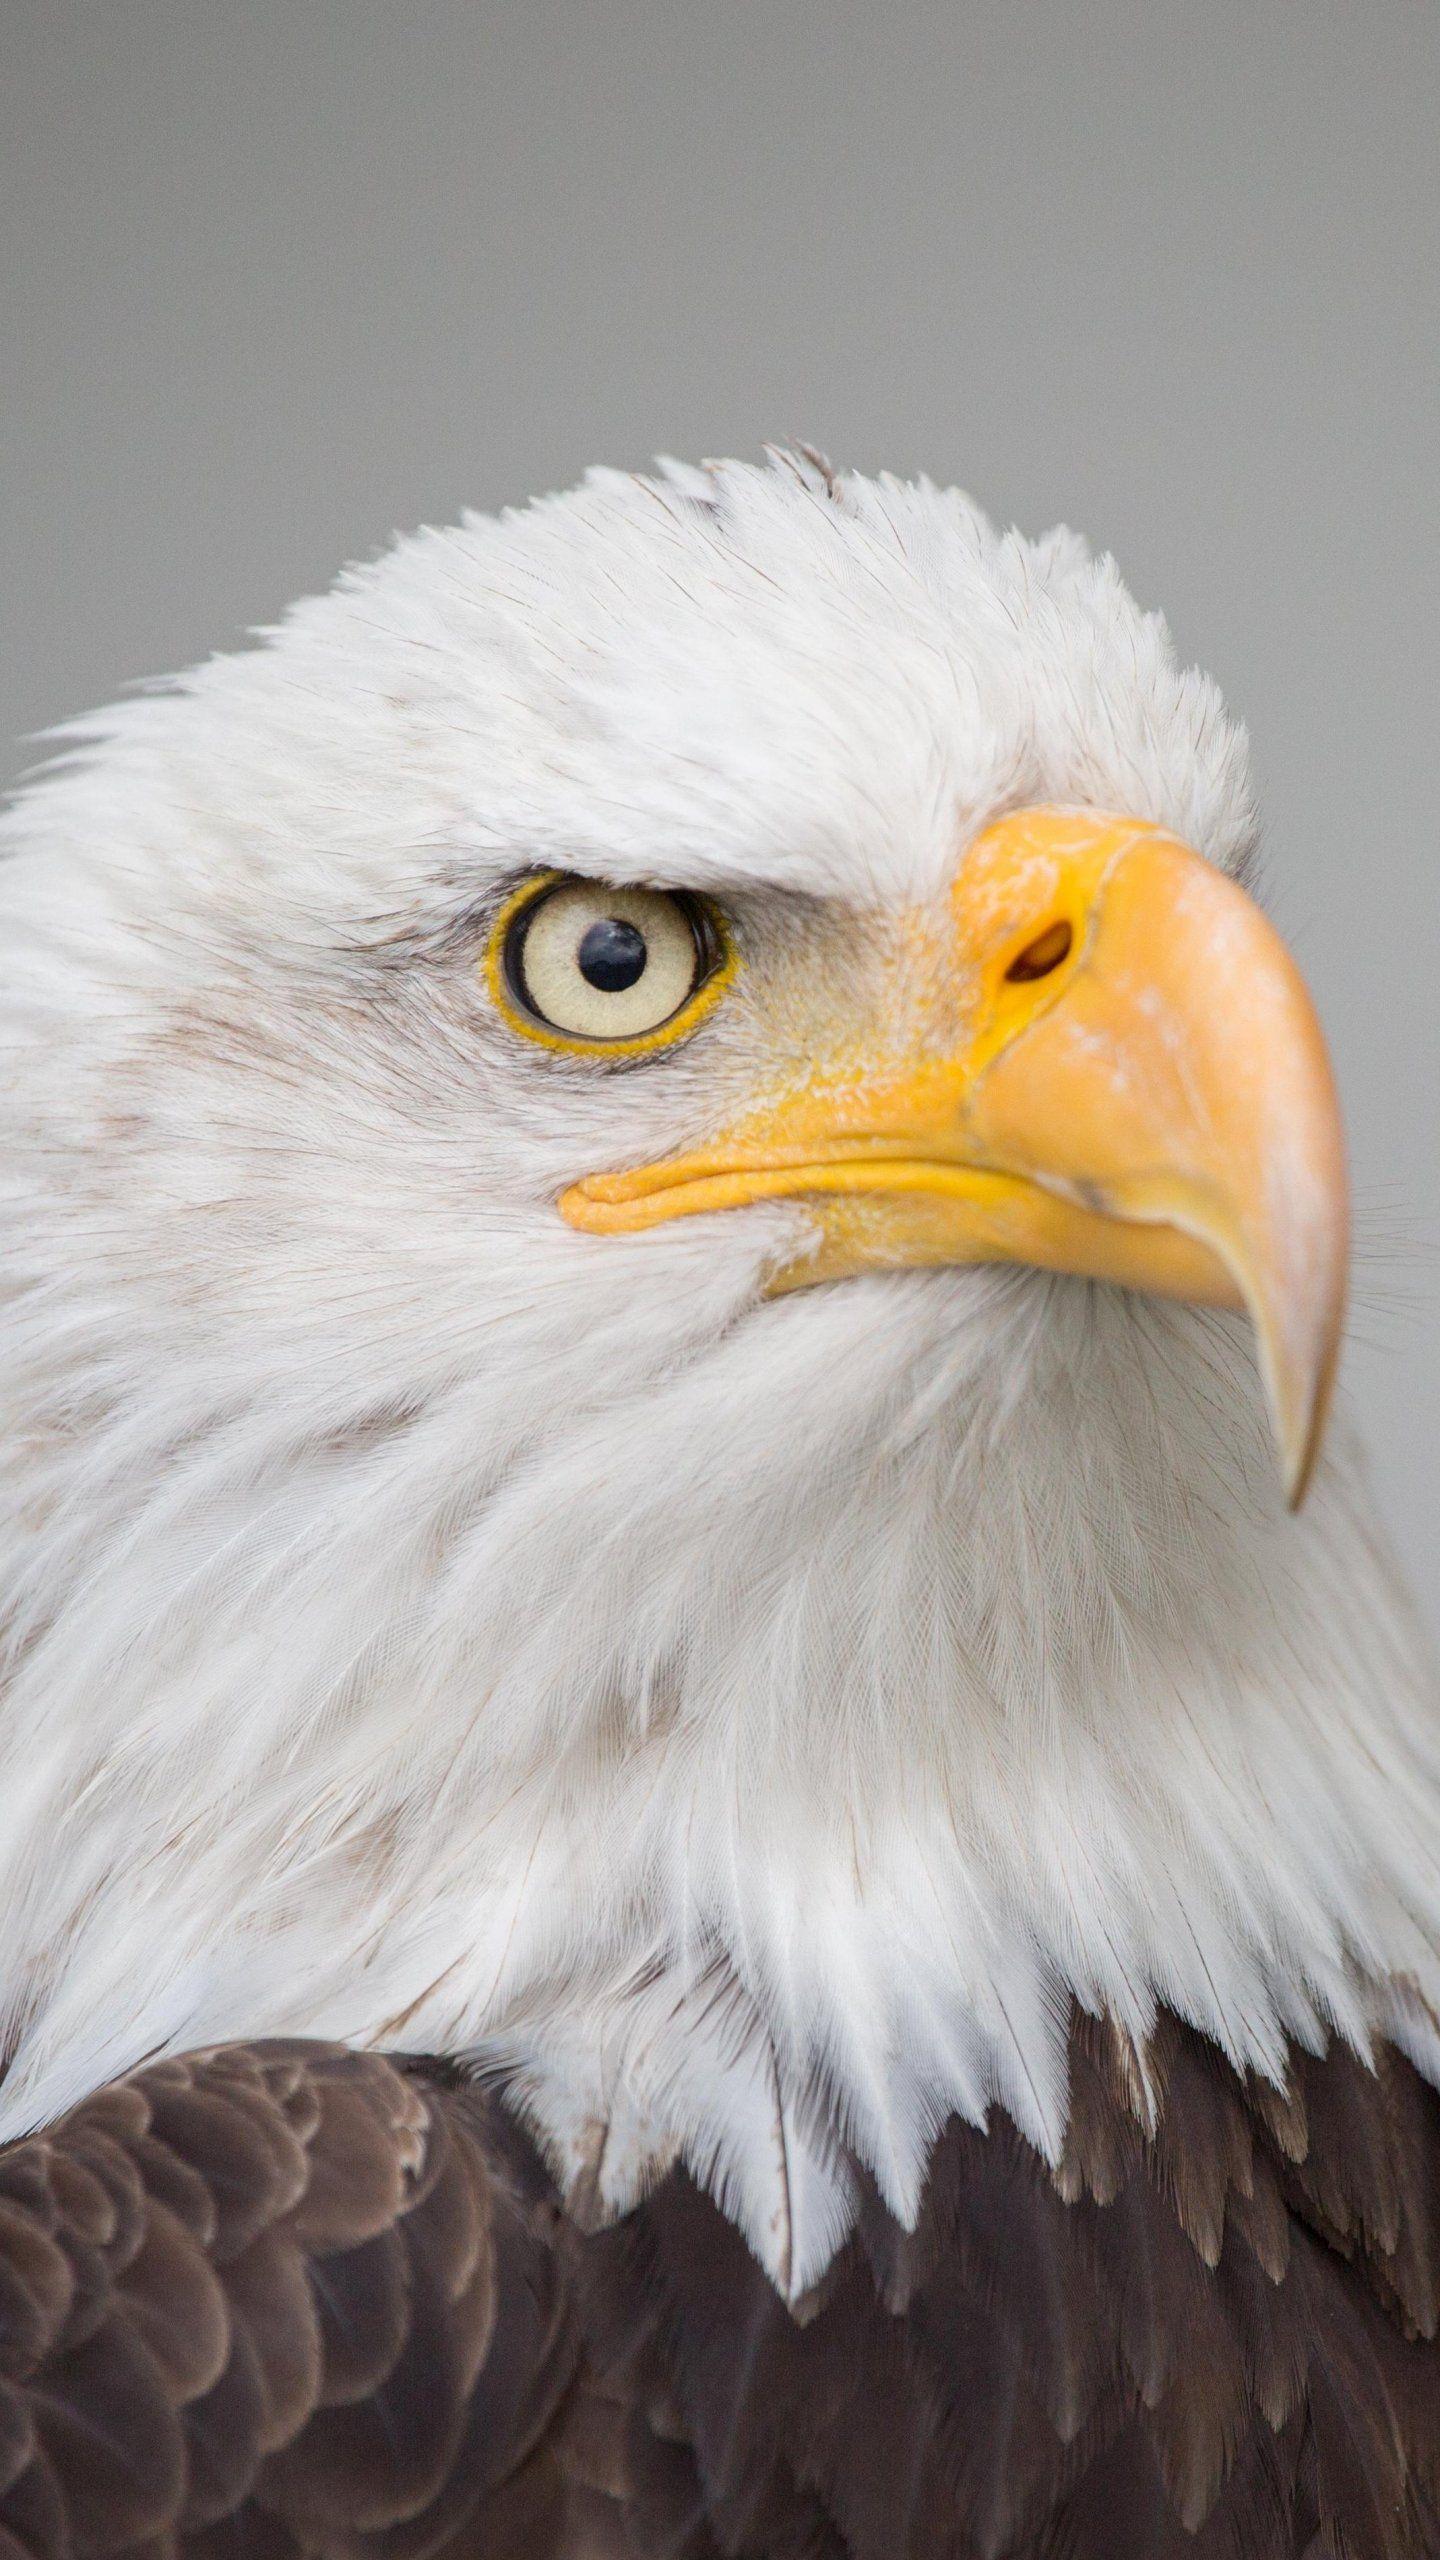 Bald Eagle Wallpaper Iphone Android Desktop Backgrounds In 2021 Eagle Wallpaper Bald Eagle Animal Wallpaper Eagle wallpaper hd download